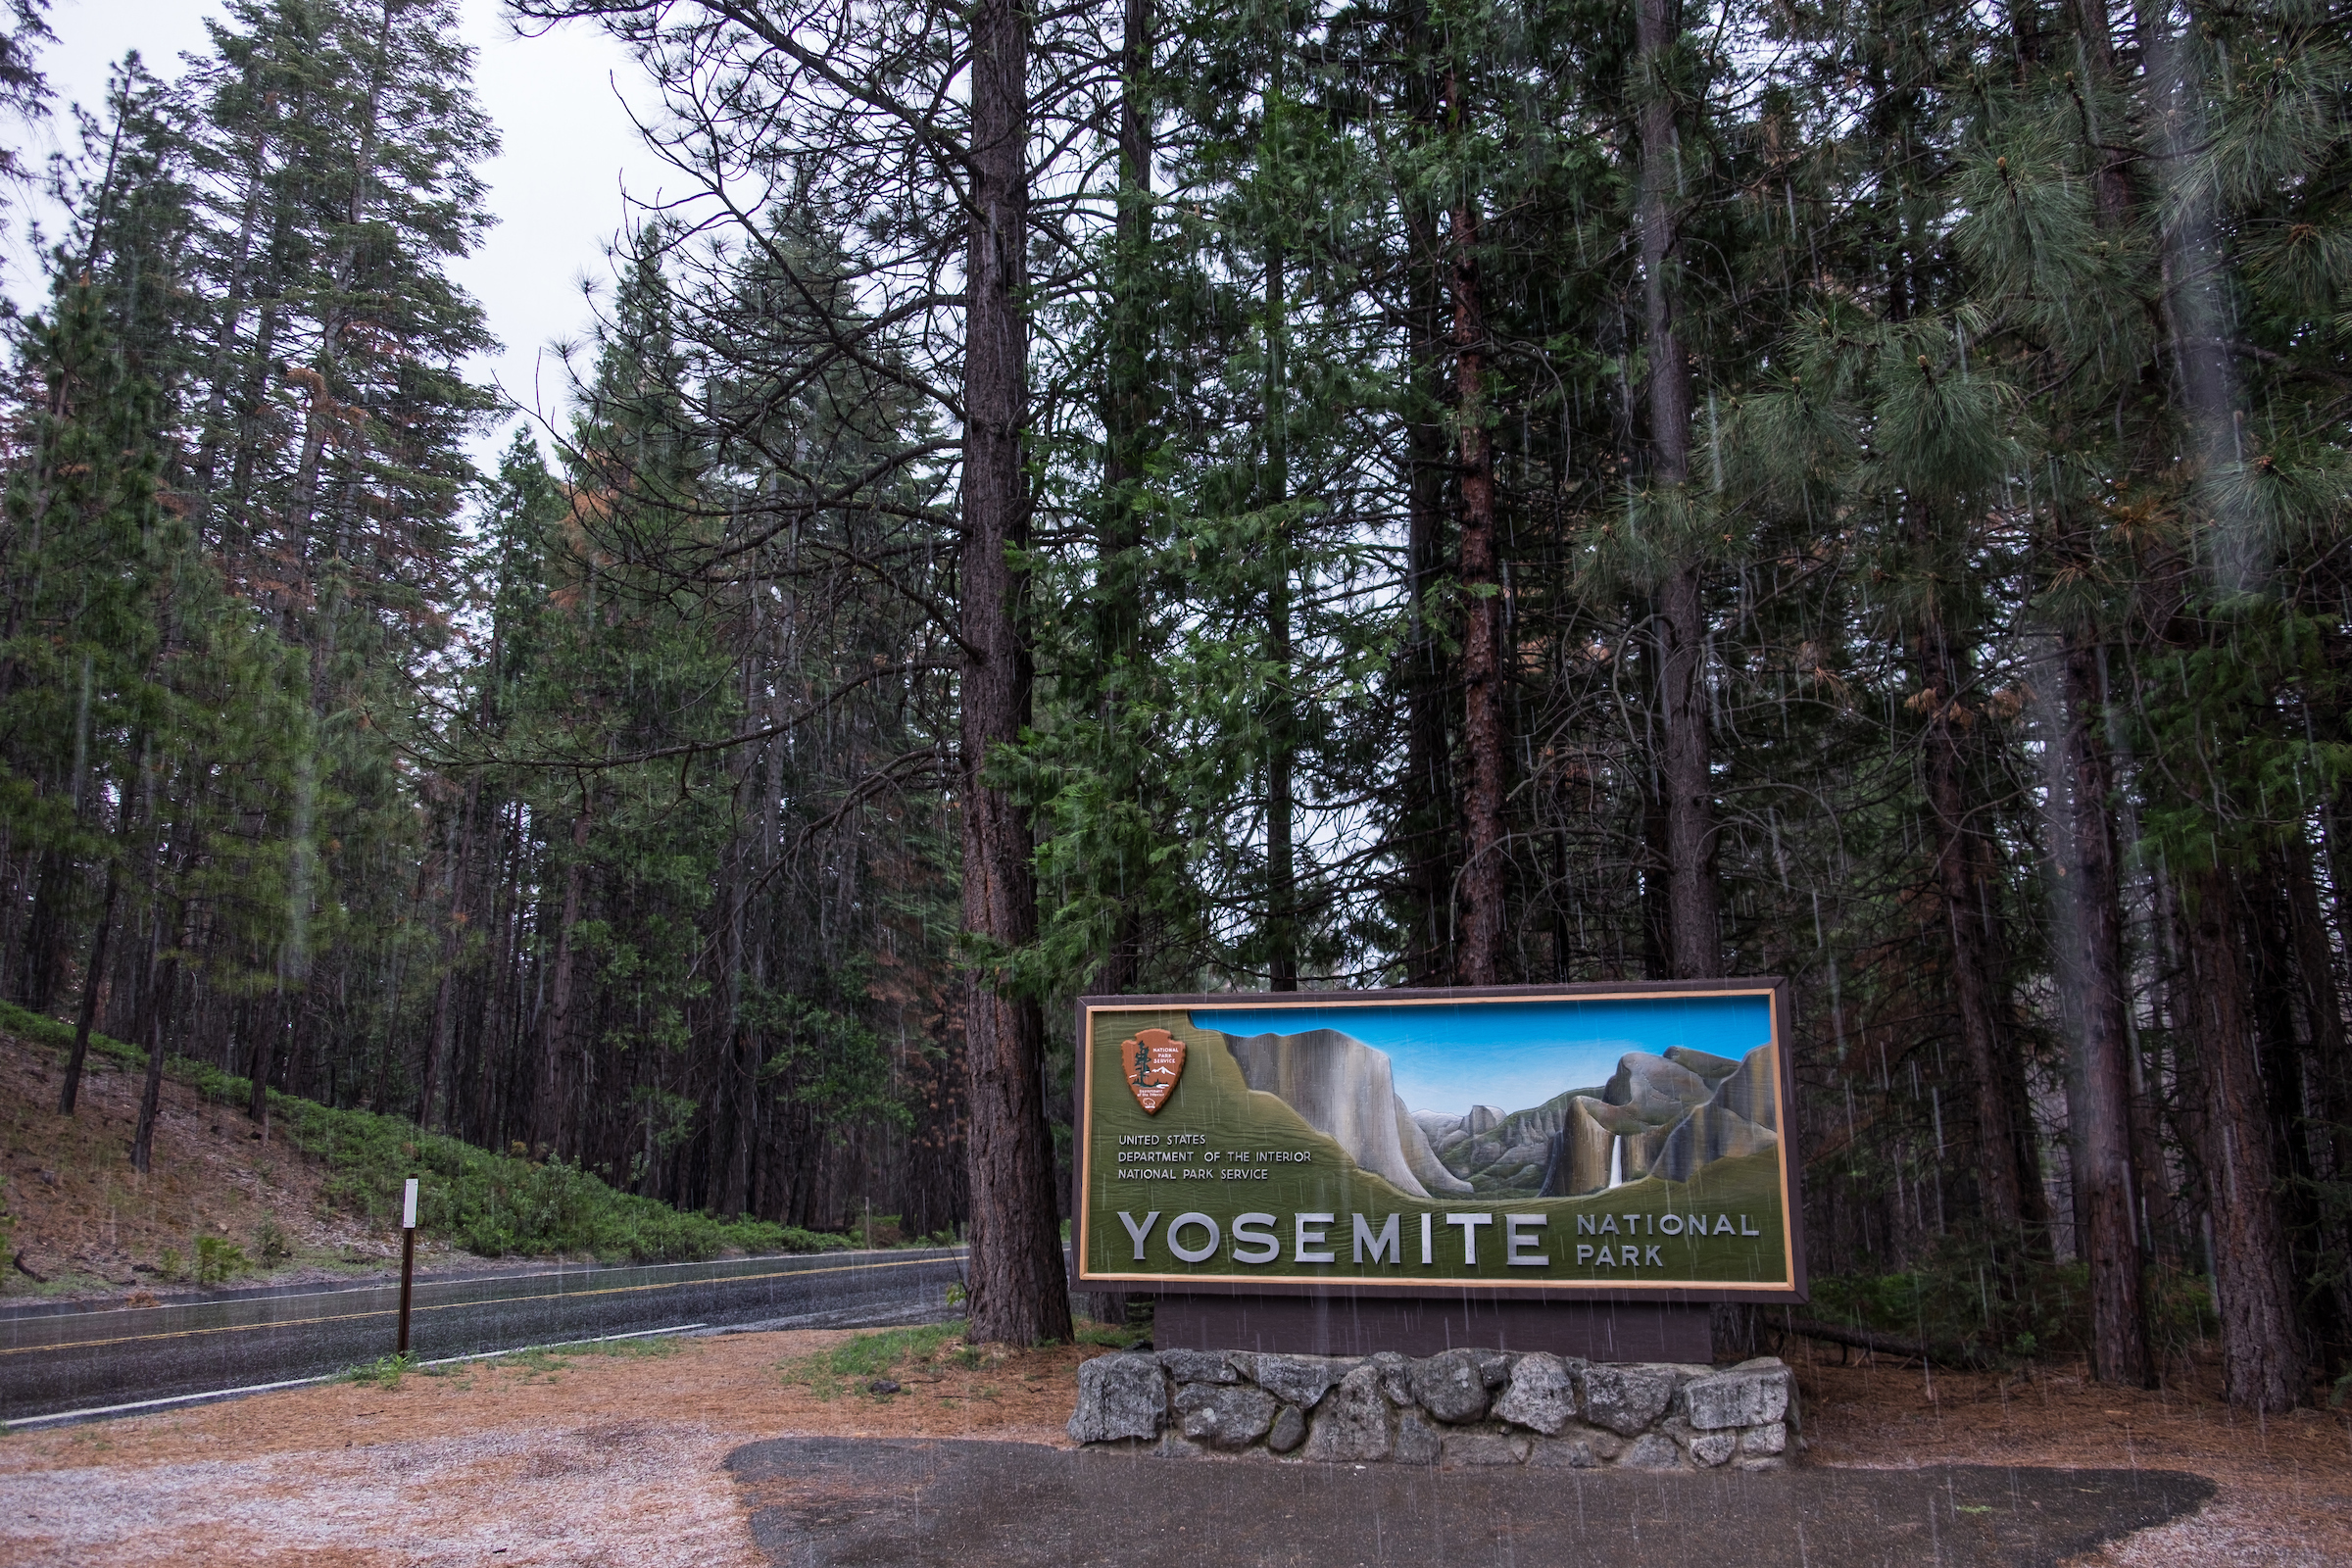 20160521-SP-Yosemite National Park-_DSF5001 (1).jpg